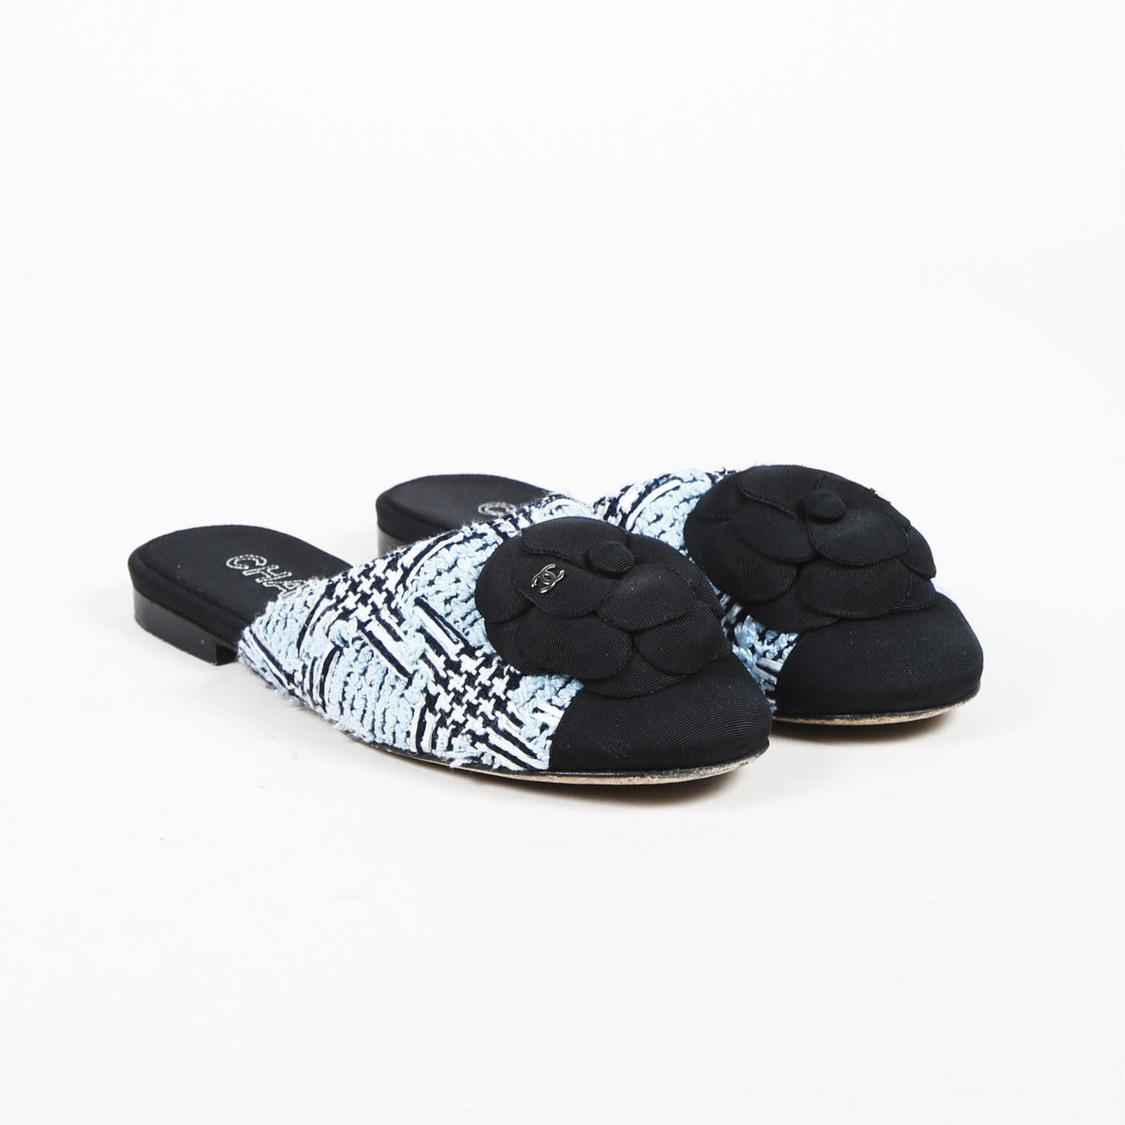 a289d6e6b2dc Chanel Blue   Black Tweed Camellia Cap Toe Mules in Blue - Lyst